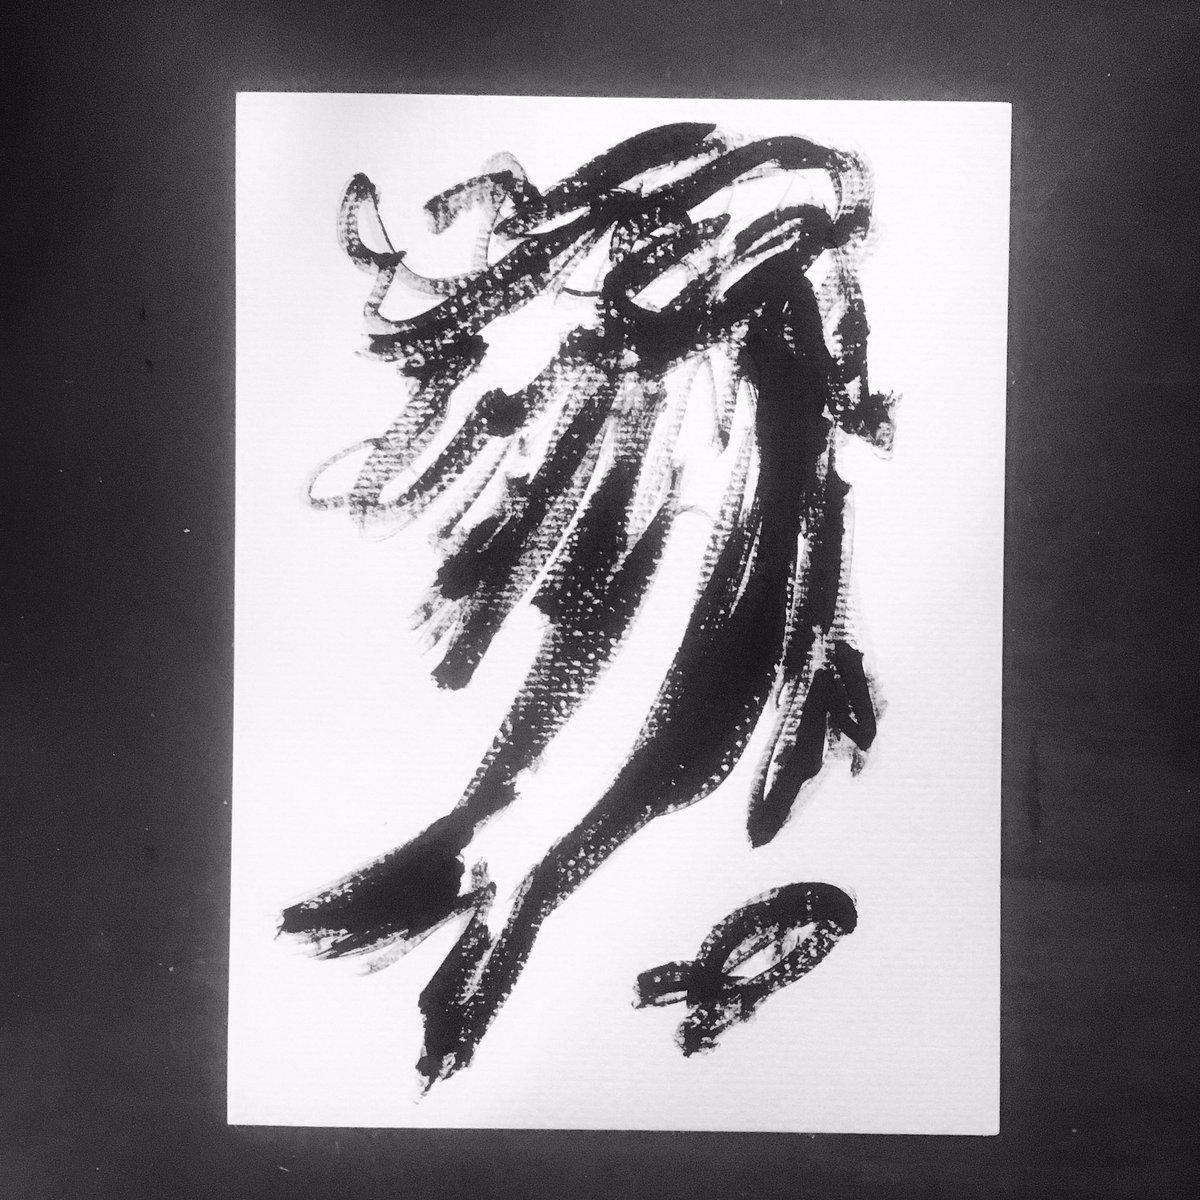 #MerMay . . #art #mermaid #mermay2020 #neverstopcreating #workinprogress #outsiderart #painting #inthestudio #socialdistancing  #wacommermay2020 #coffee #reddesk #rousselart #savetheocean #plasticfree #savetheplanet… http://instagram.com/p/CAq11ooB1b4/…pic.twitter.com/NoTaUsiwG0